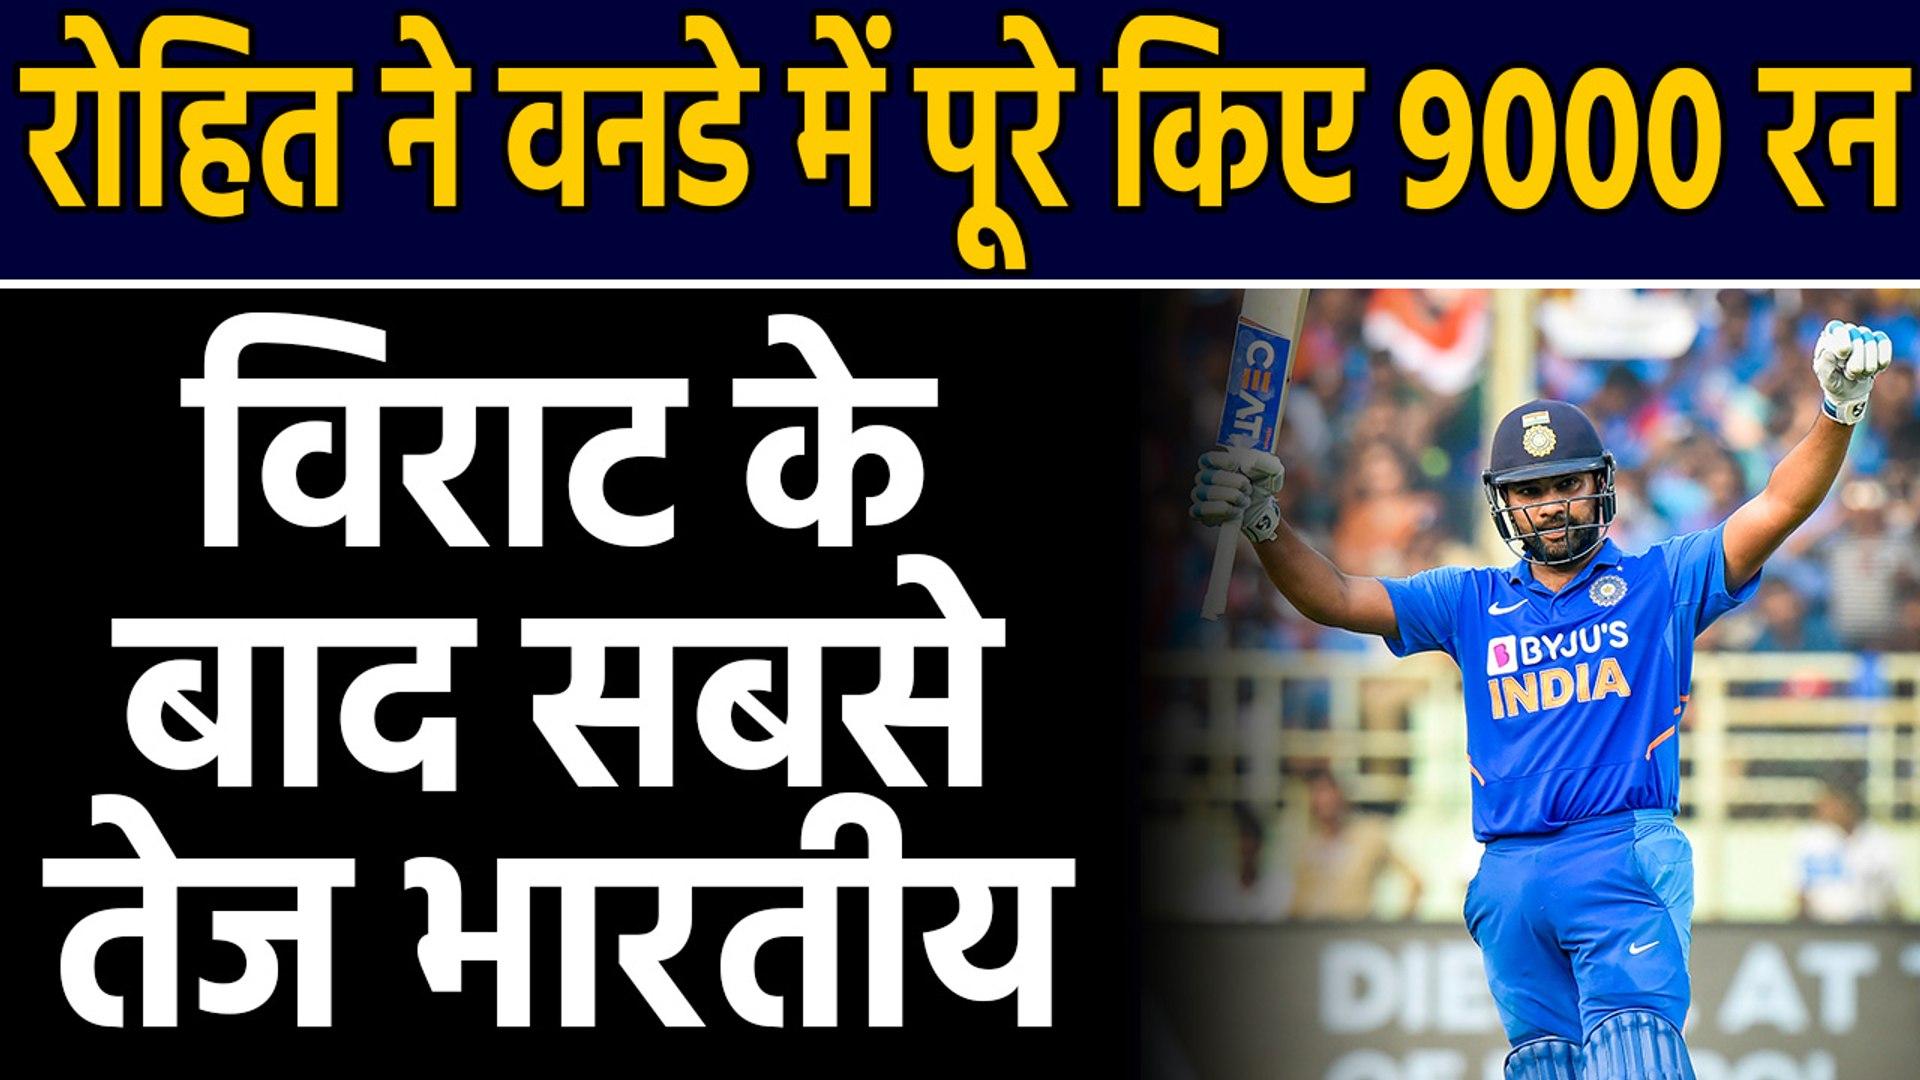 IND vs AUS 3rd ODI: Rohit Sharma becomes 2nd fastest to 9000 ODI runs | वनइंडिया हिंदी